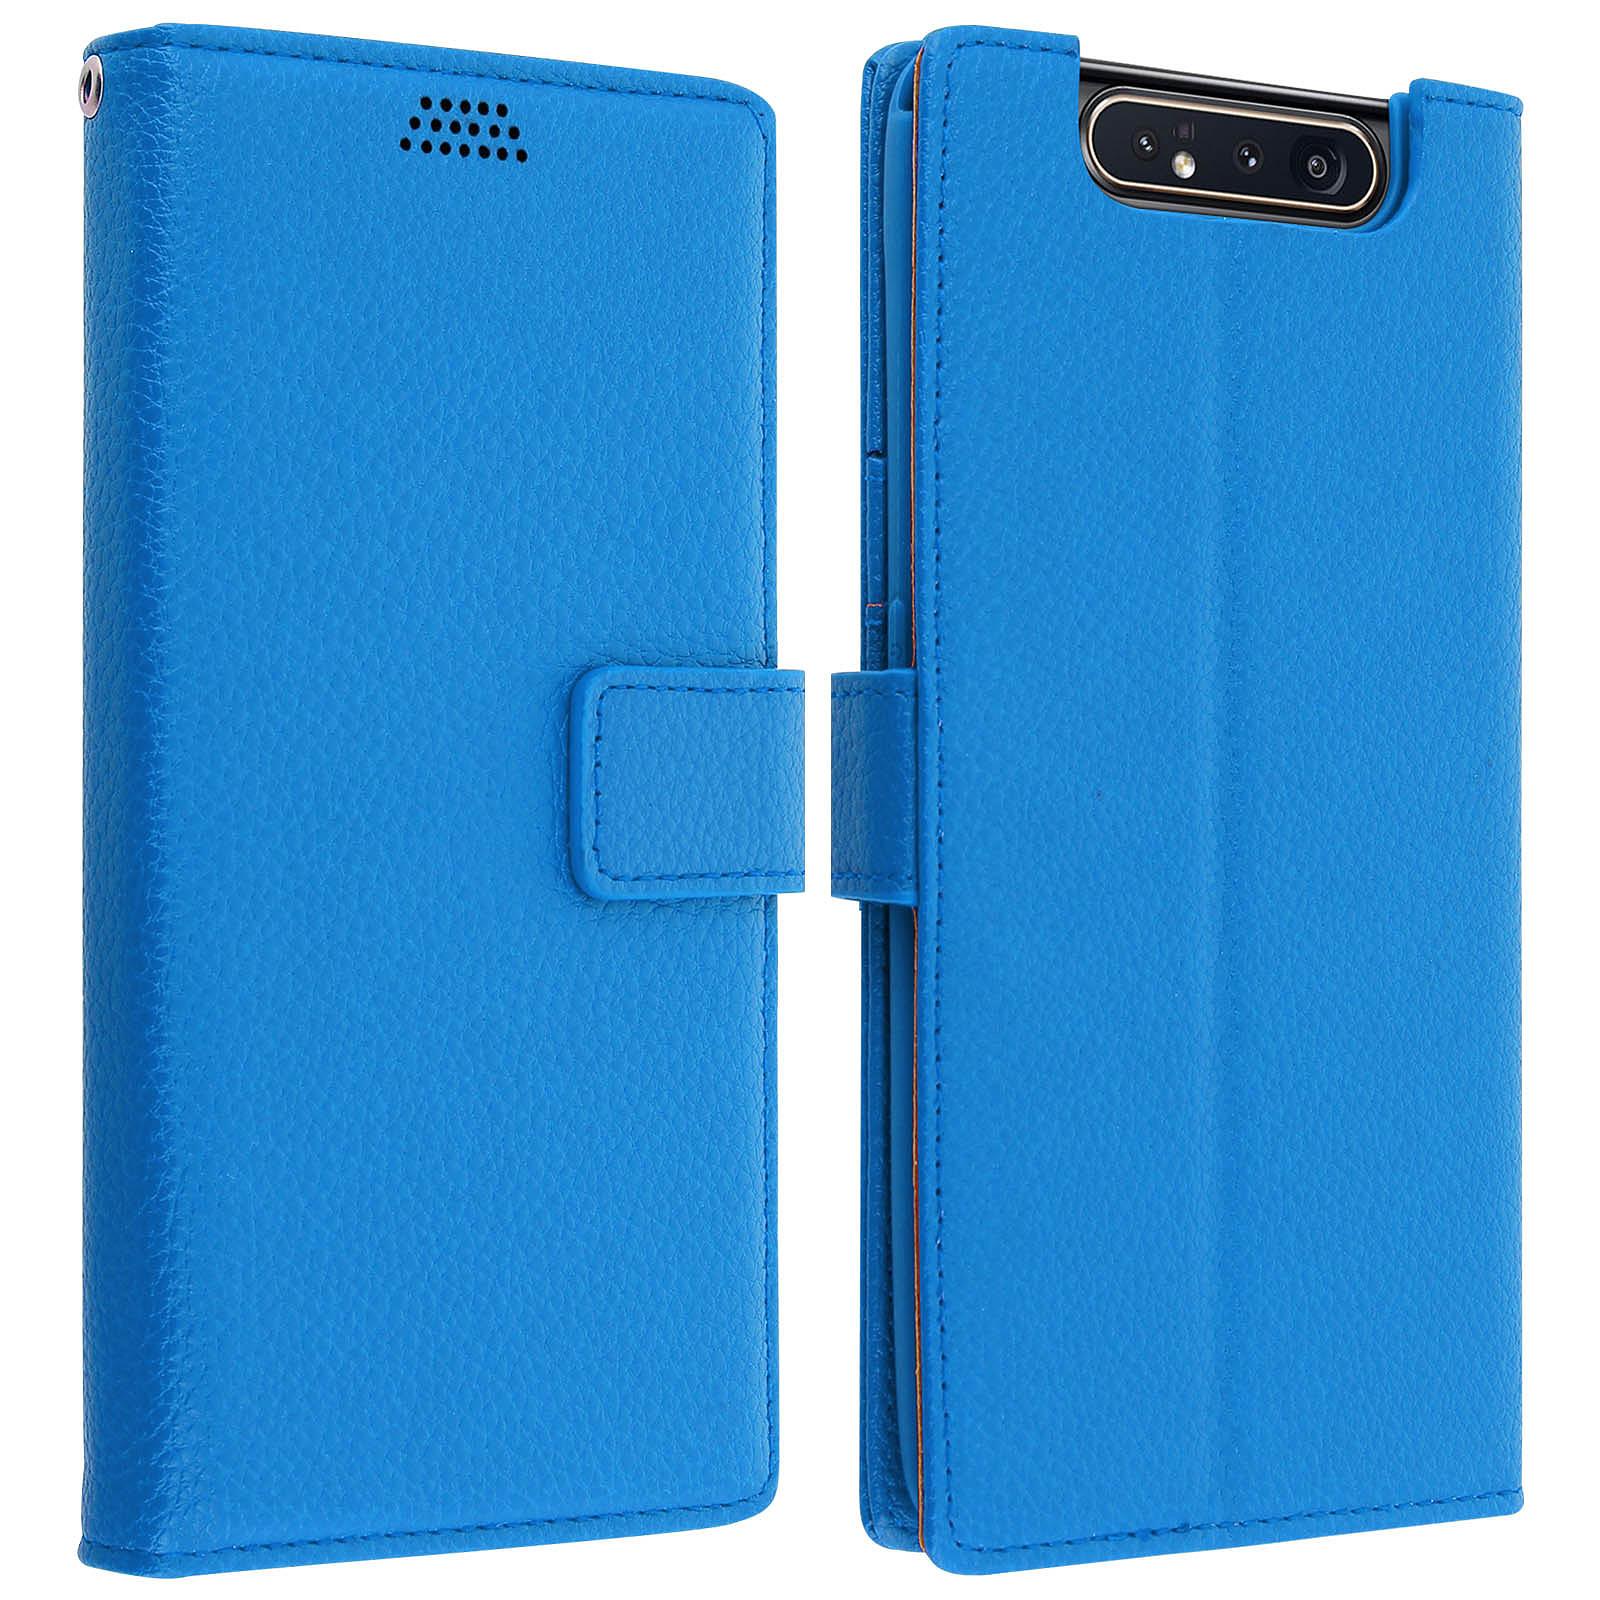 Avizar Etui folio Bleu pour Samsung Galaxy A80